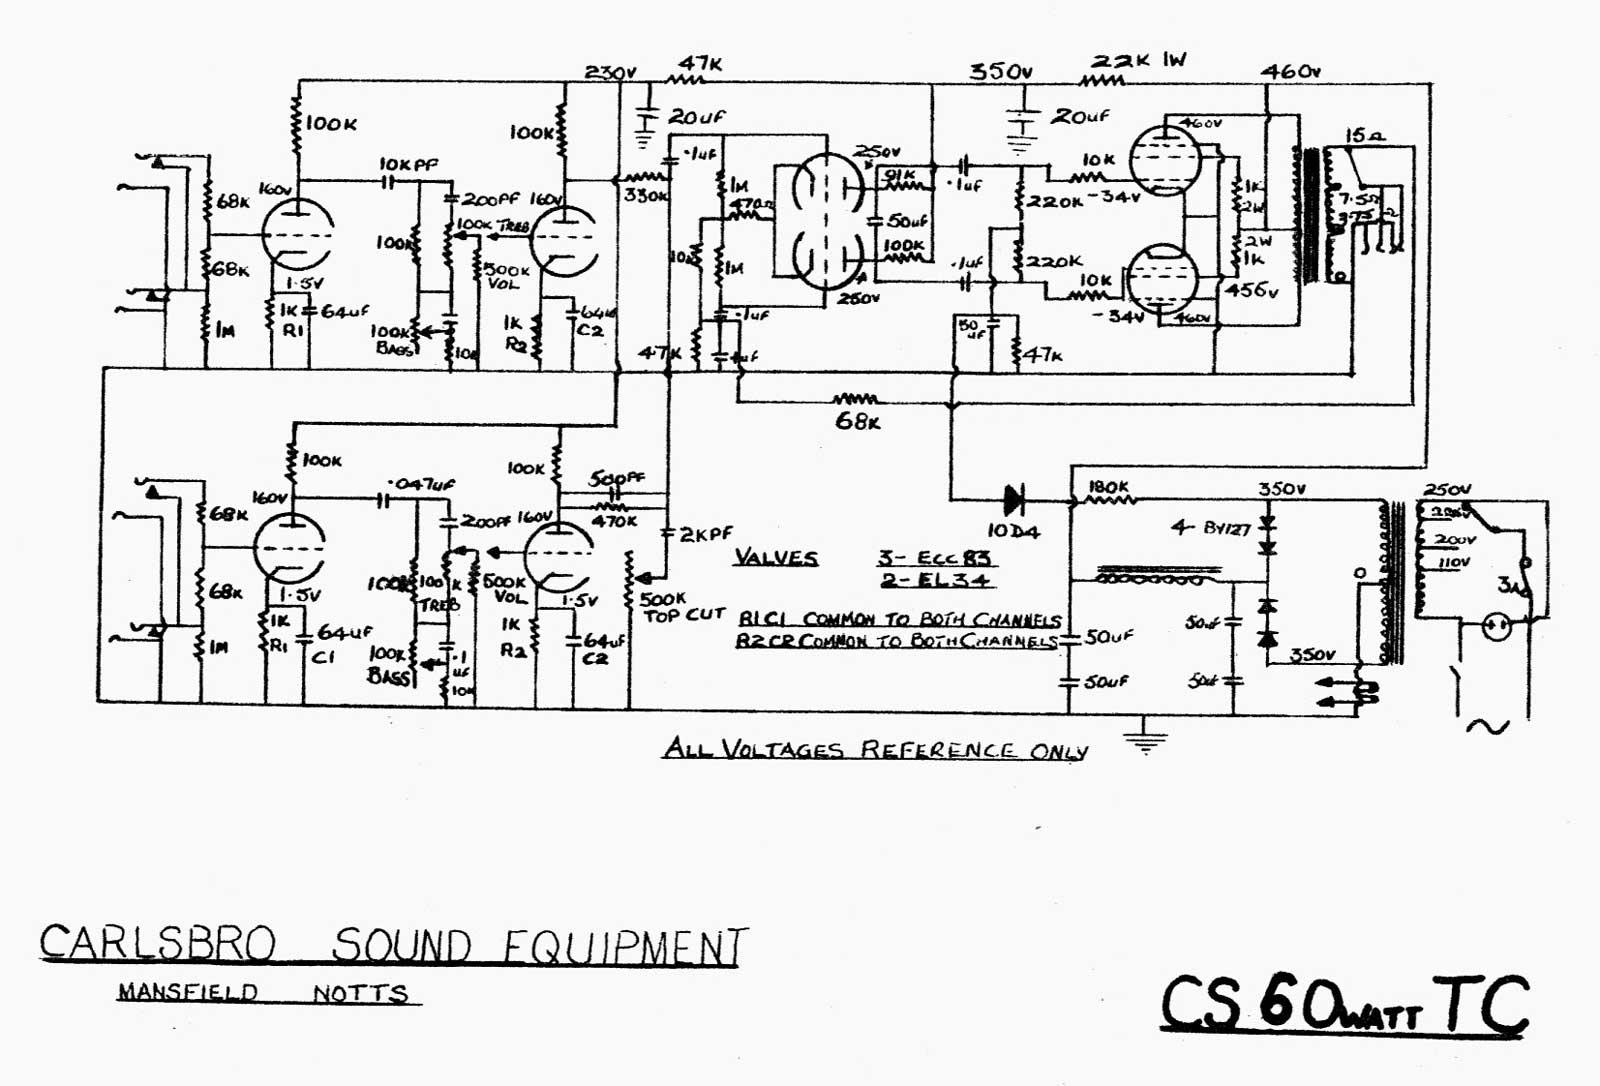 1000 Watt Audio Amplifier Circuit Diagrams Carlsbro Cs60 T C Amp Schematic